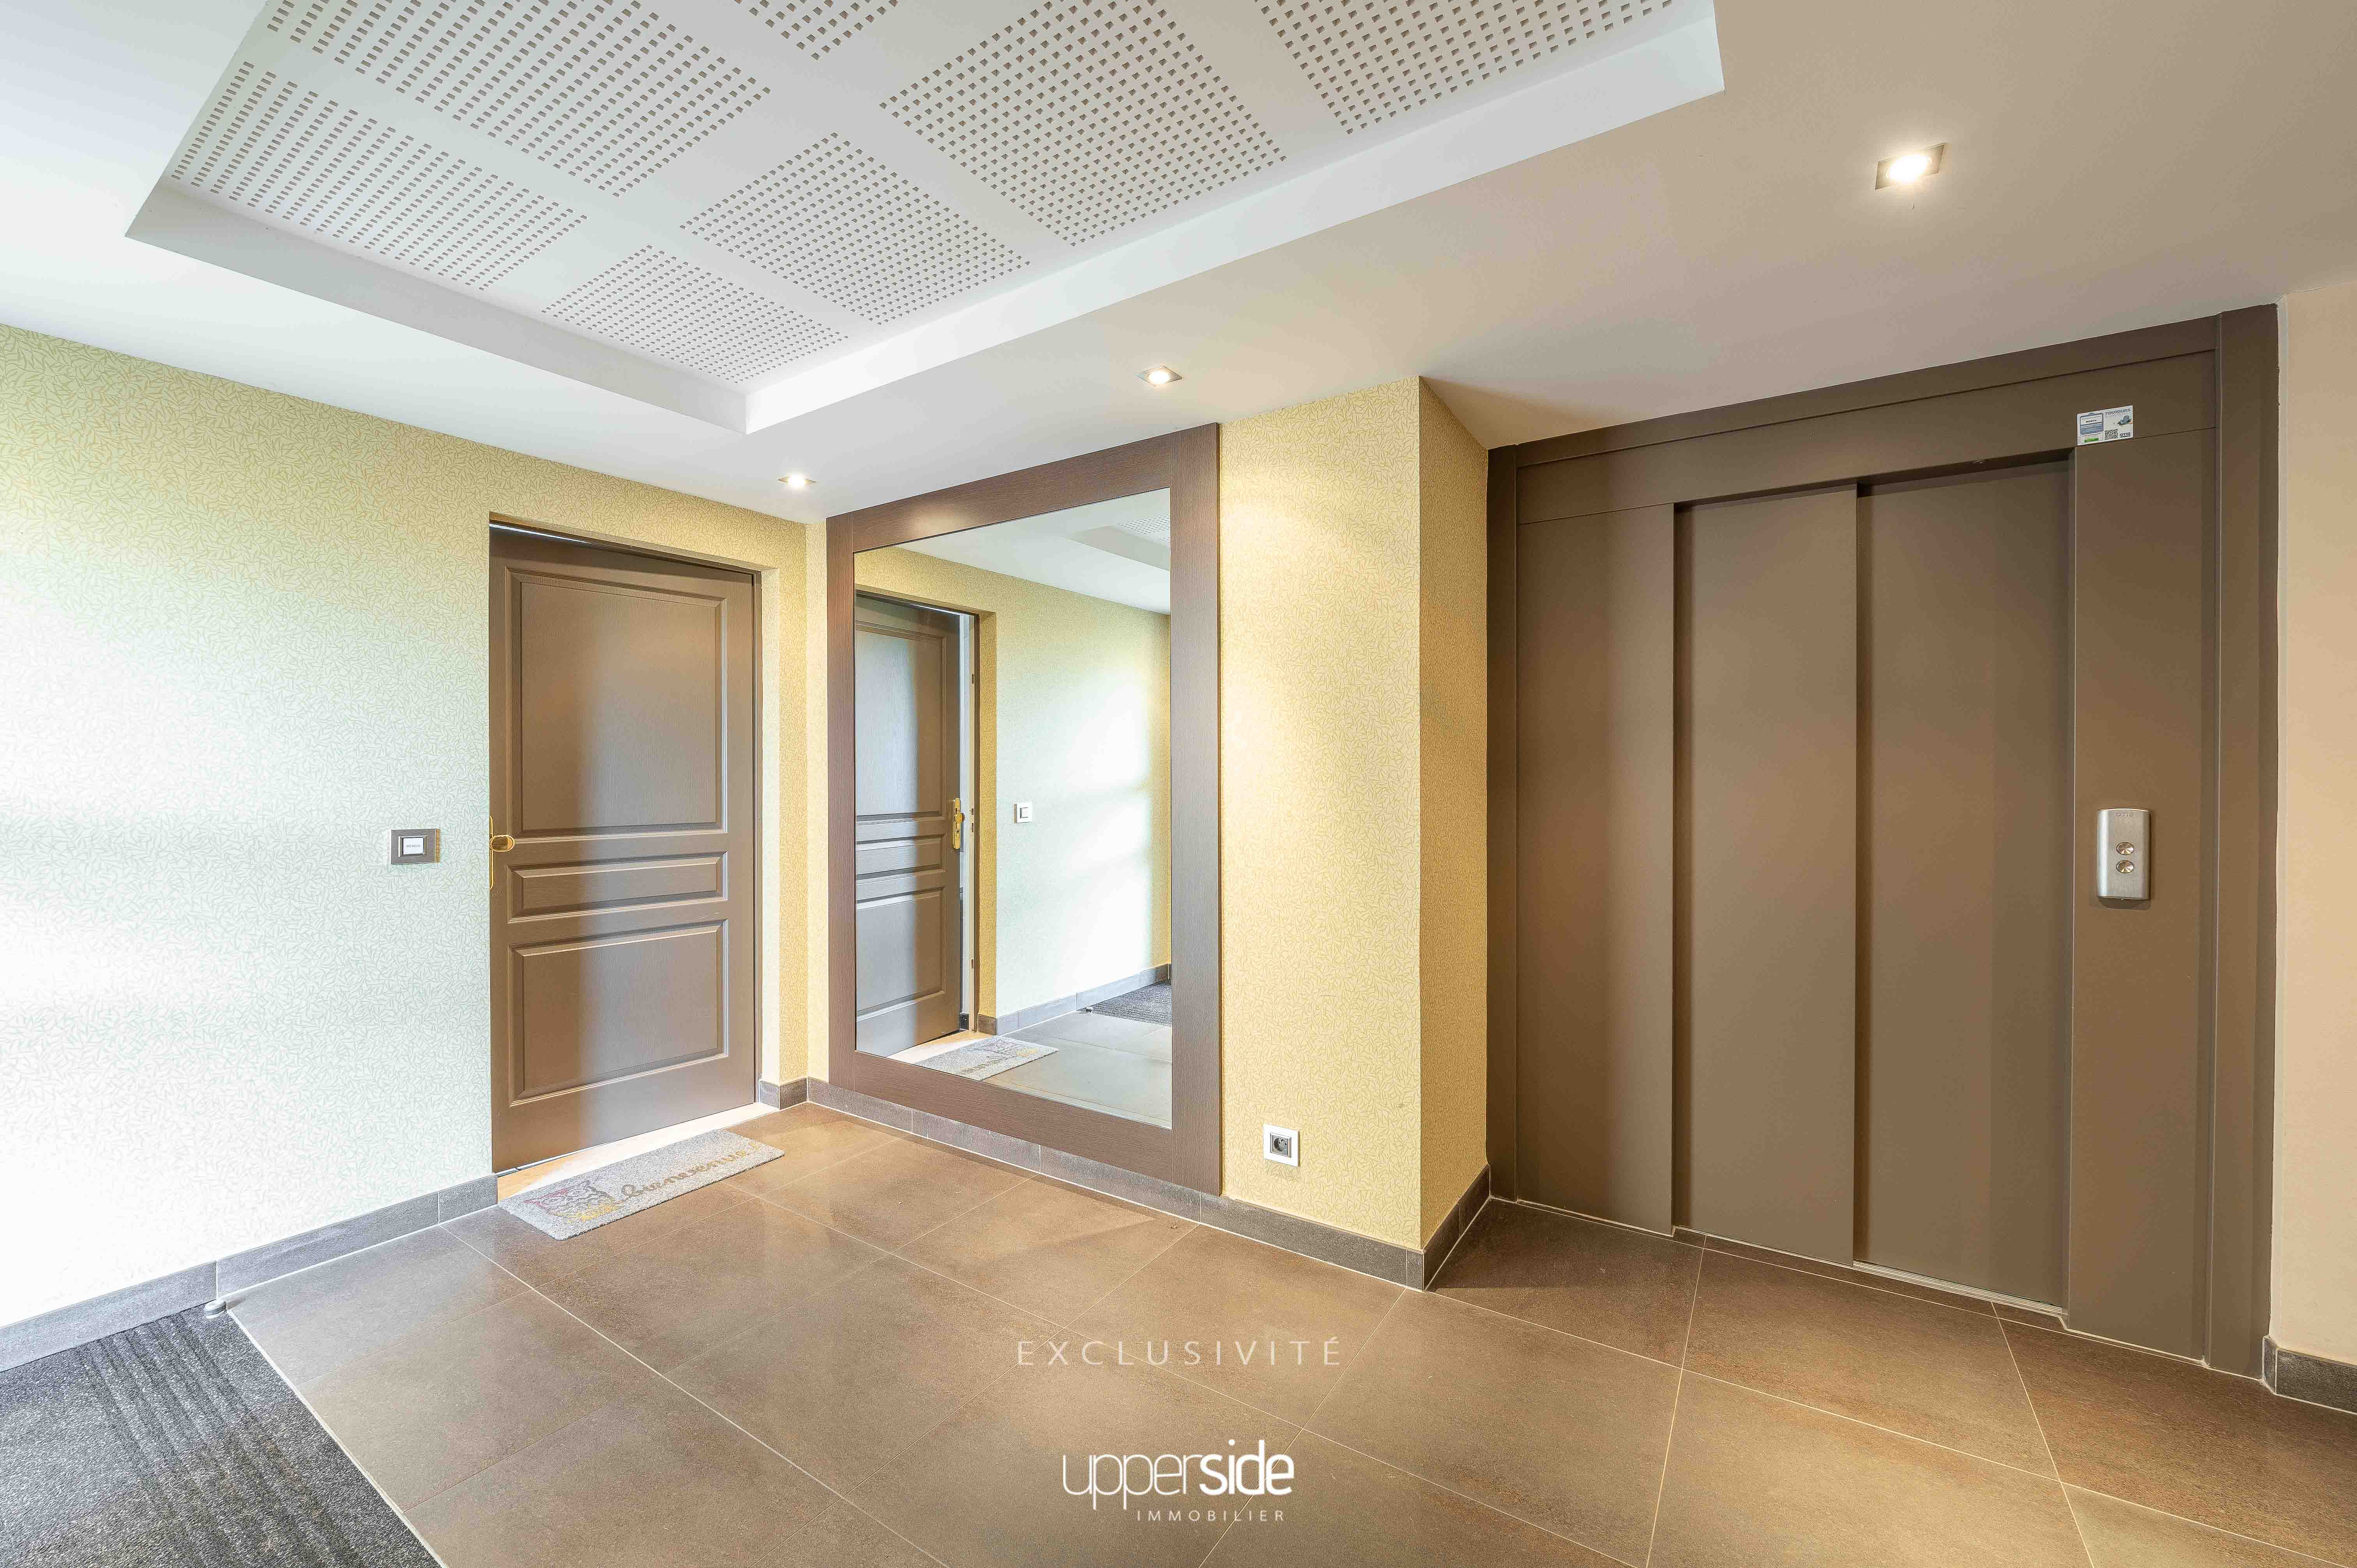 STRADIVA – Beau studio au calme avec garage Image